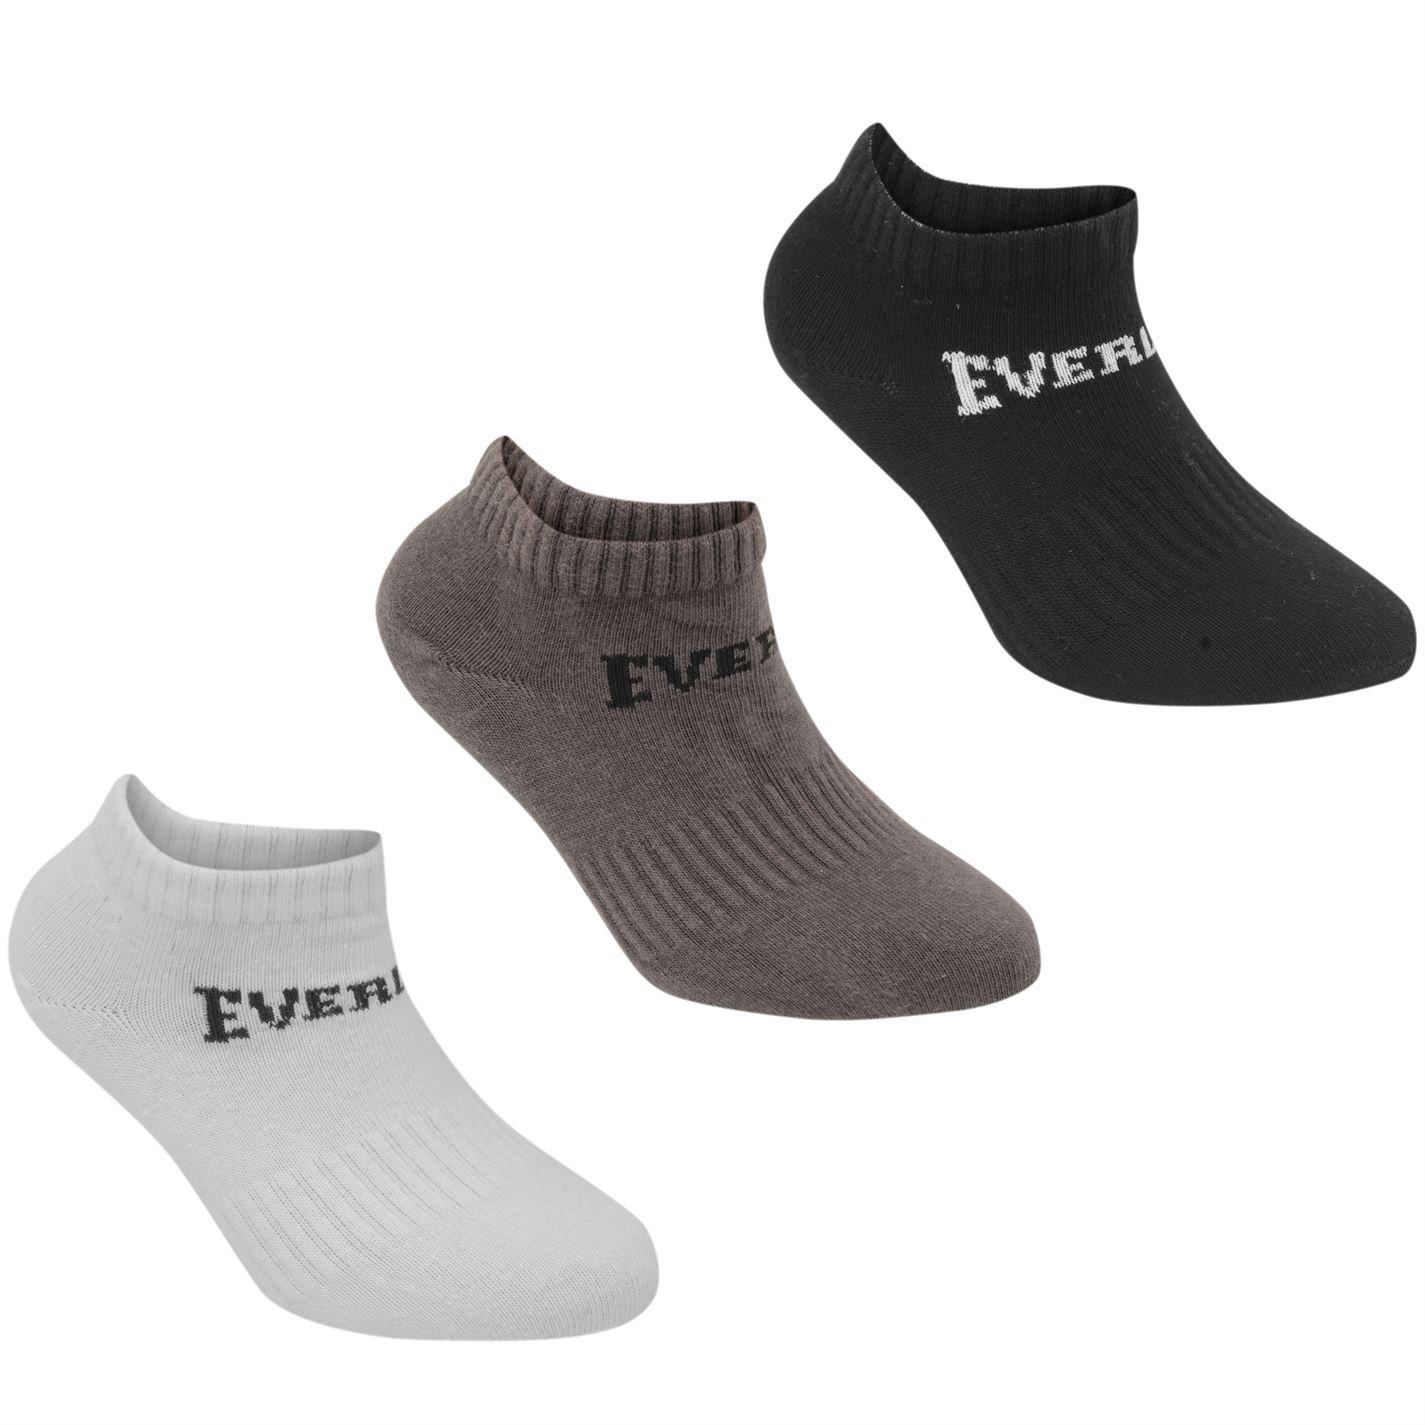 Everlast Kids 3 Pack Trainer Socks